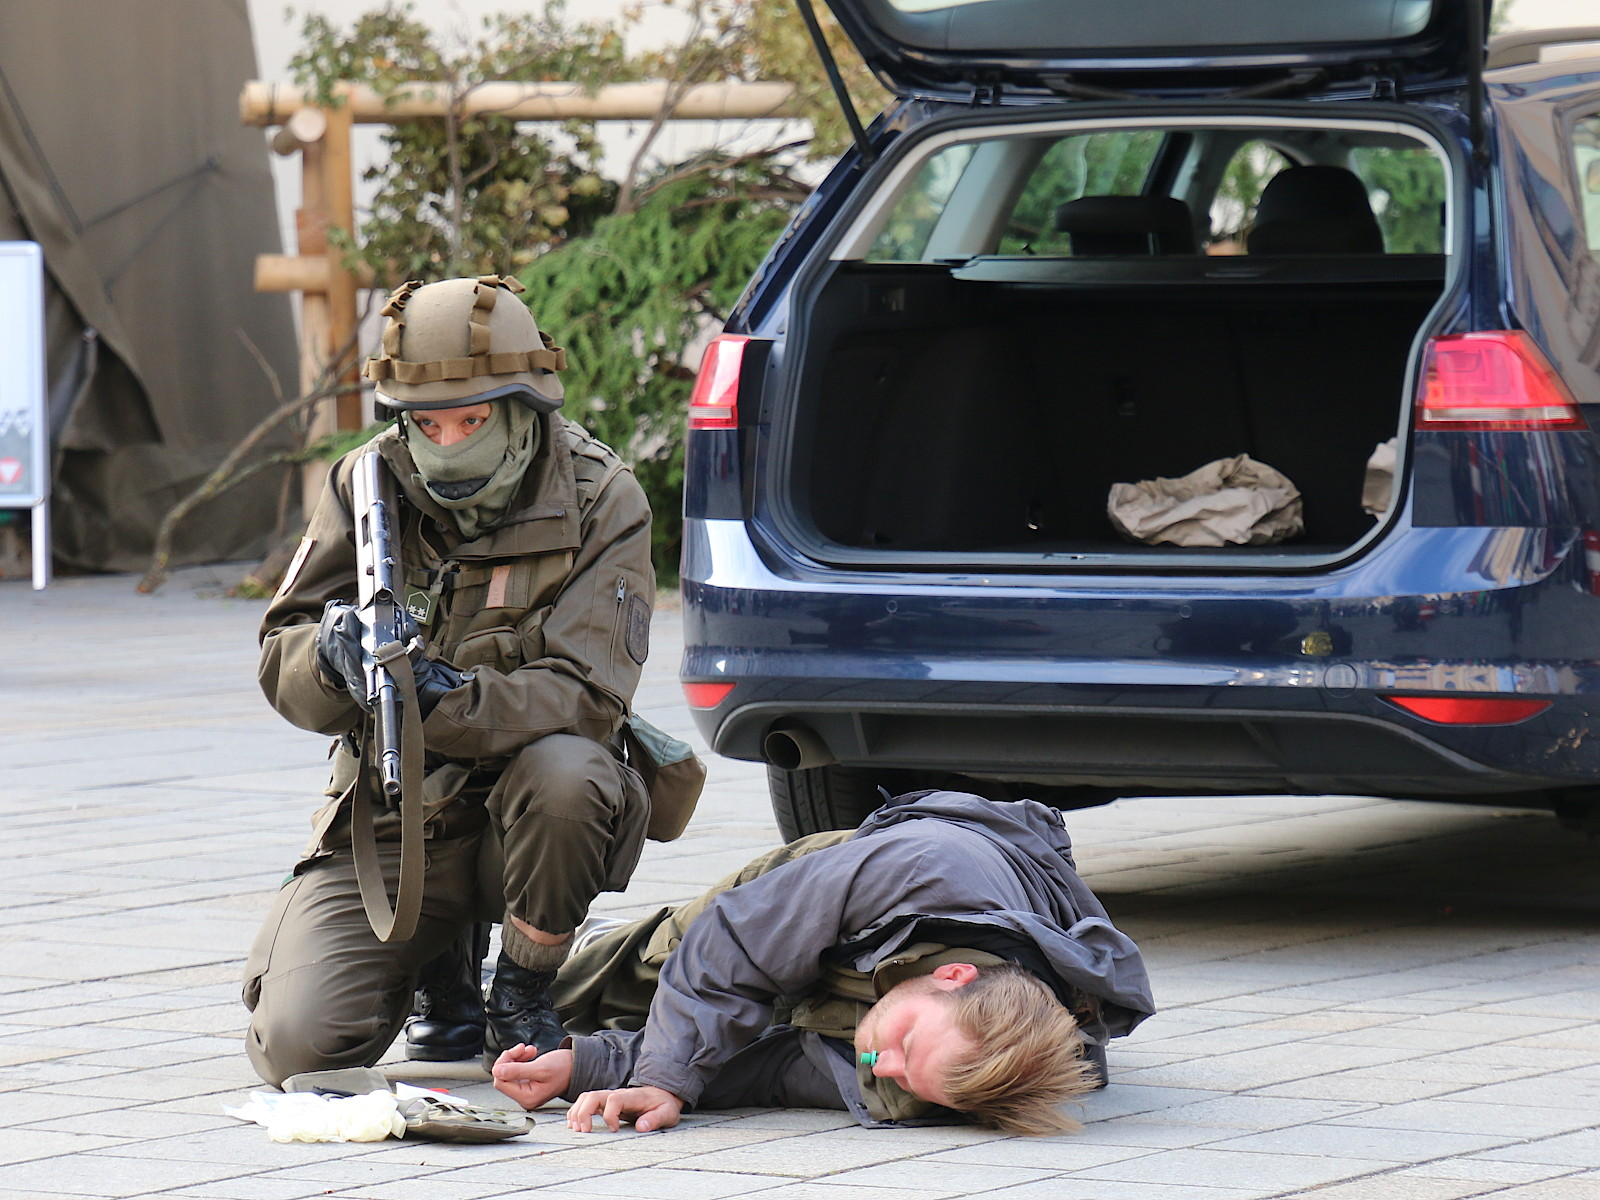 Vorführung der Miliz © Doppeladler.com